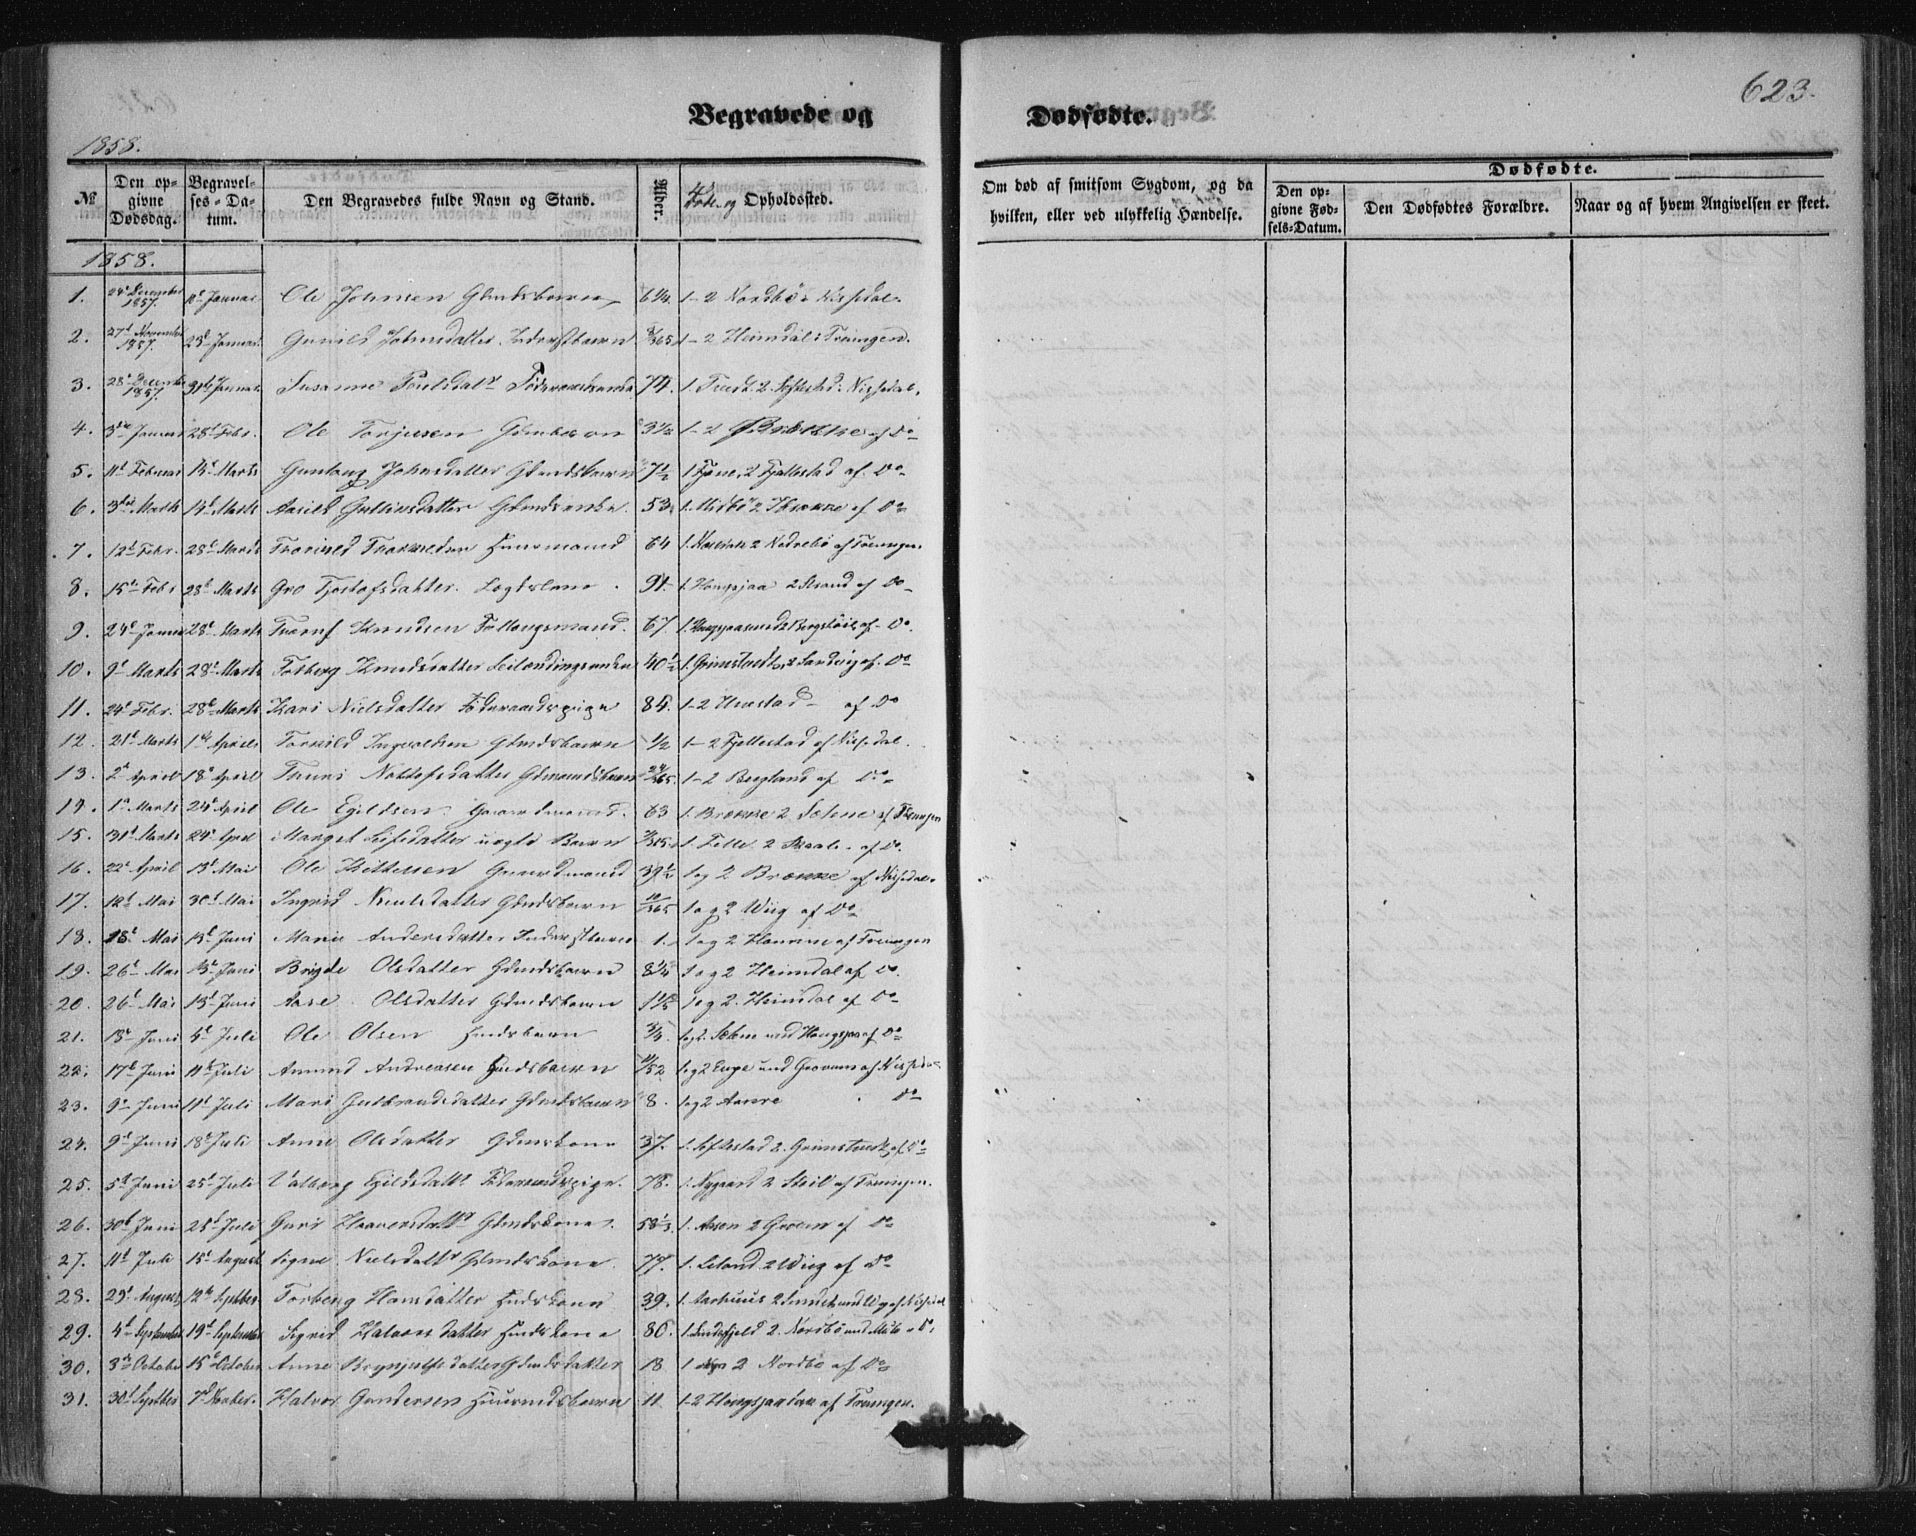 SAKO, Nissedal kirkebøker, F/Fa/L0003: Ministerialbok nr. I 3, 1846-1870, s. 622-623